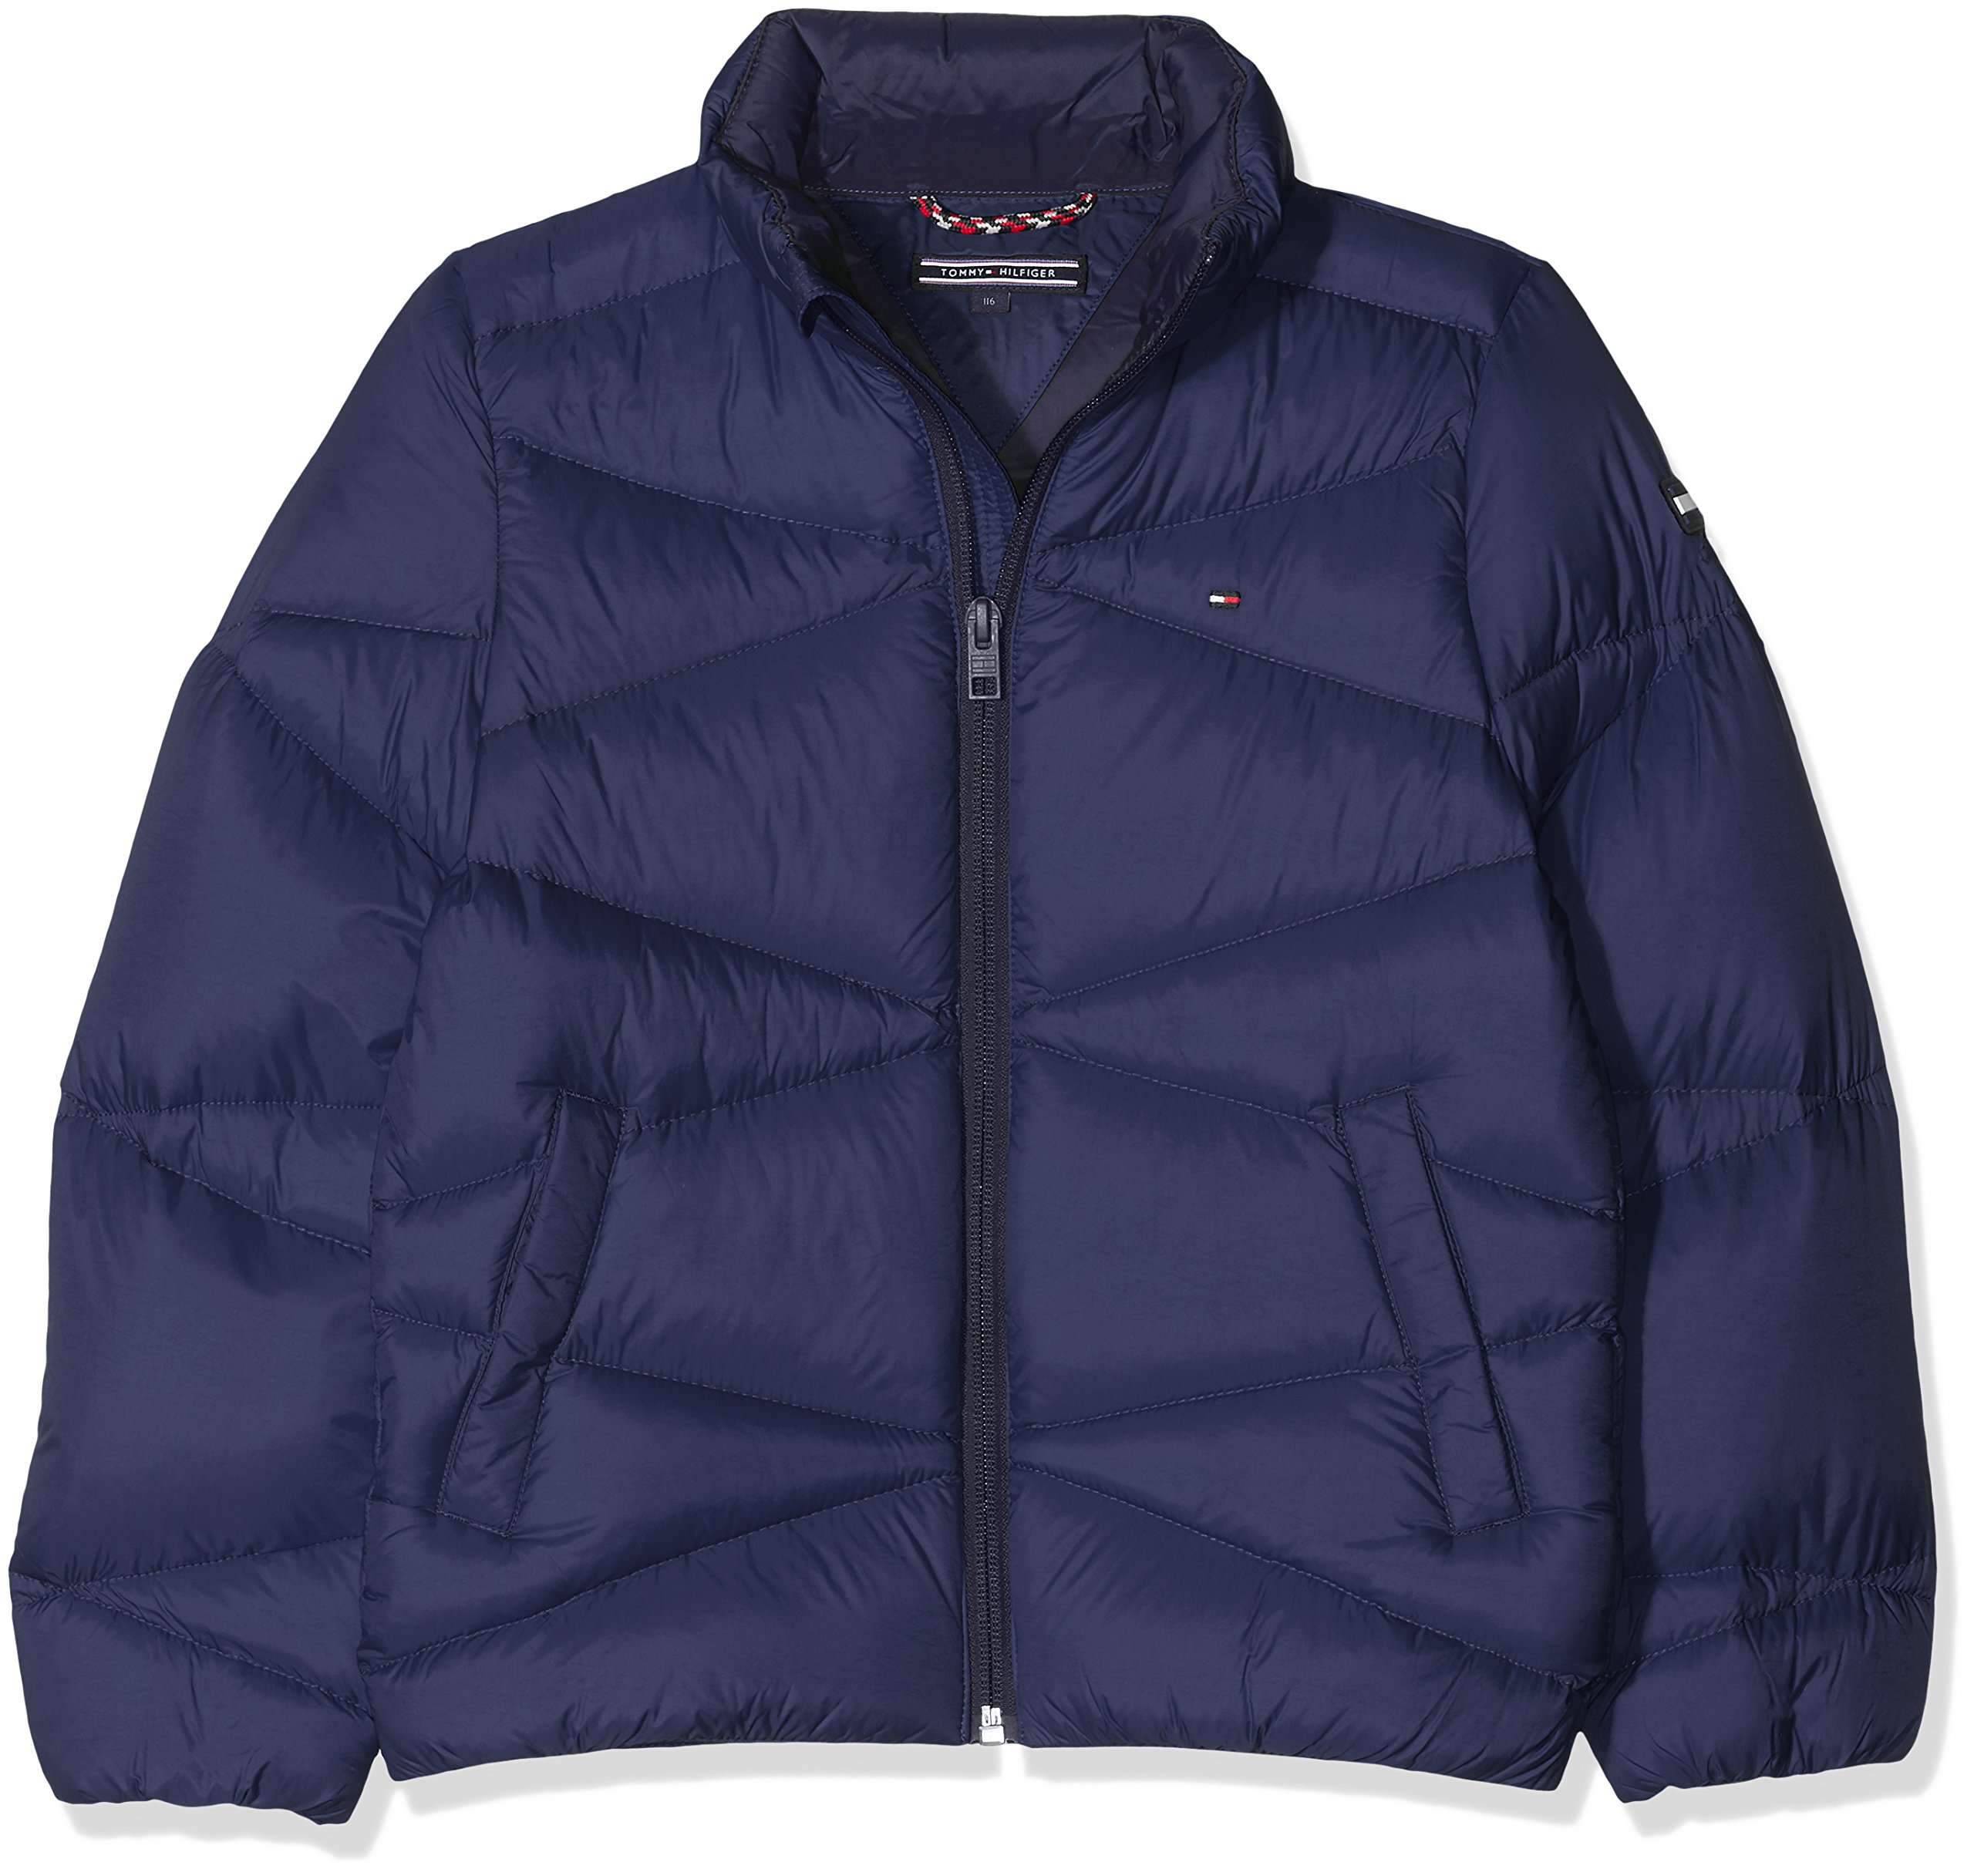 Tommy Hilfiger Packable Light Down Jacket Chaqueta para Niños